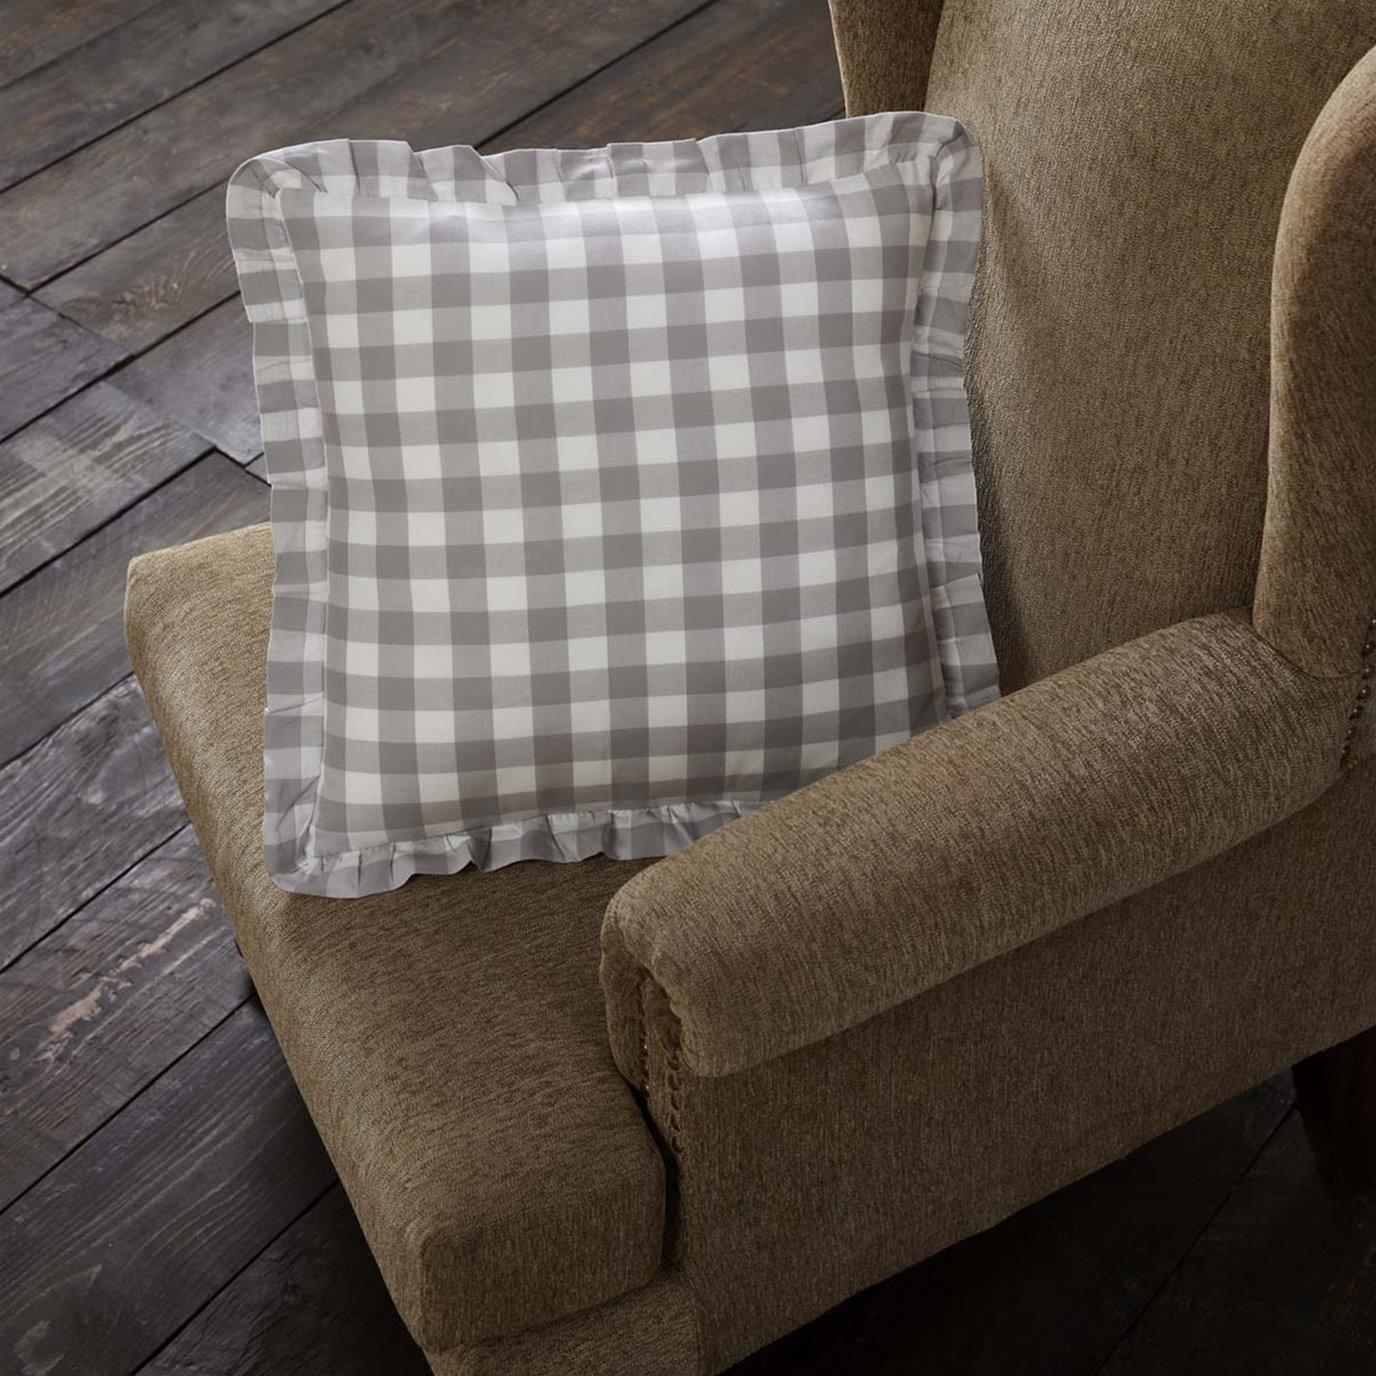 Annie Buffalo Grey Check Ruffled Fabric Pillow 18x18